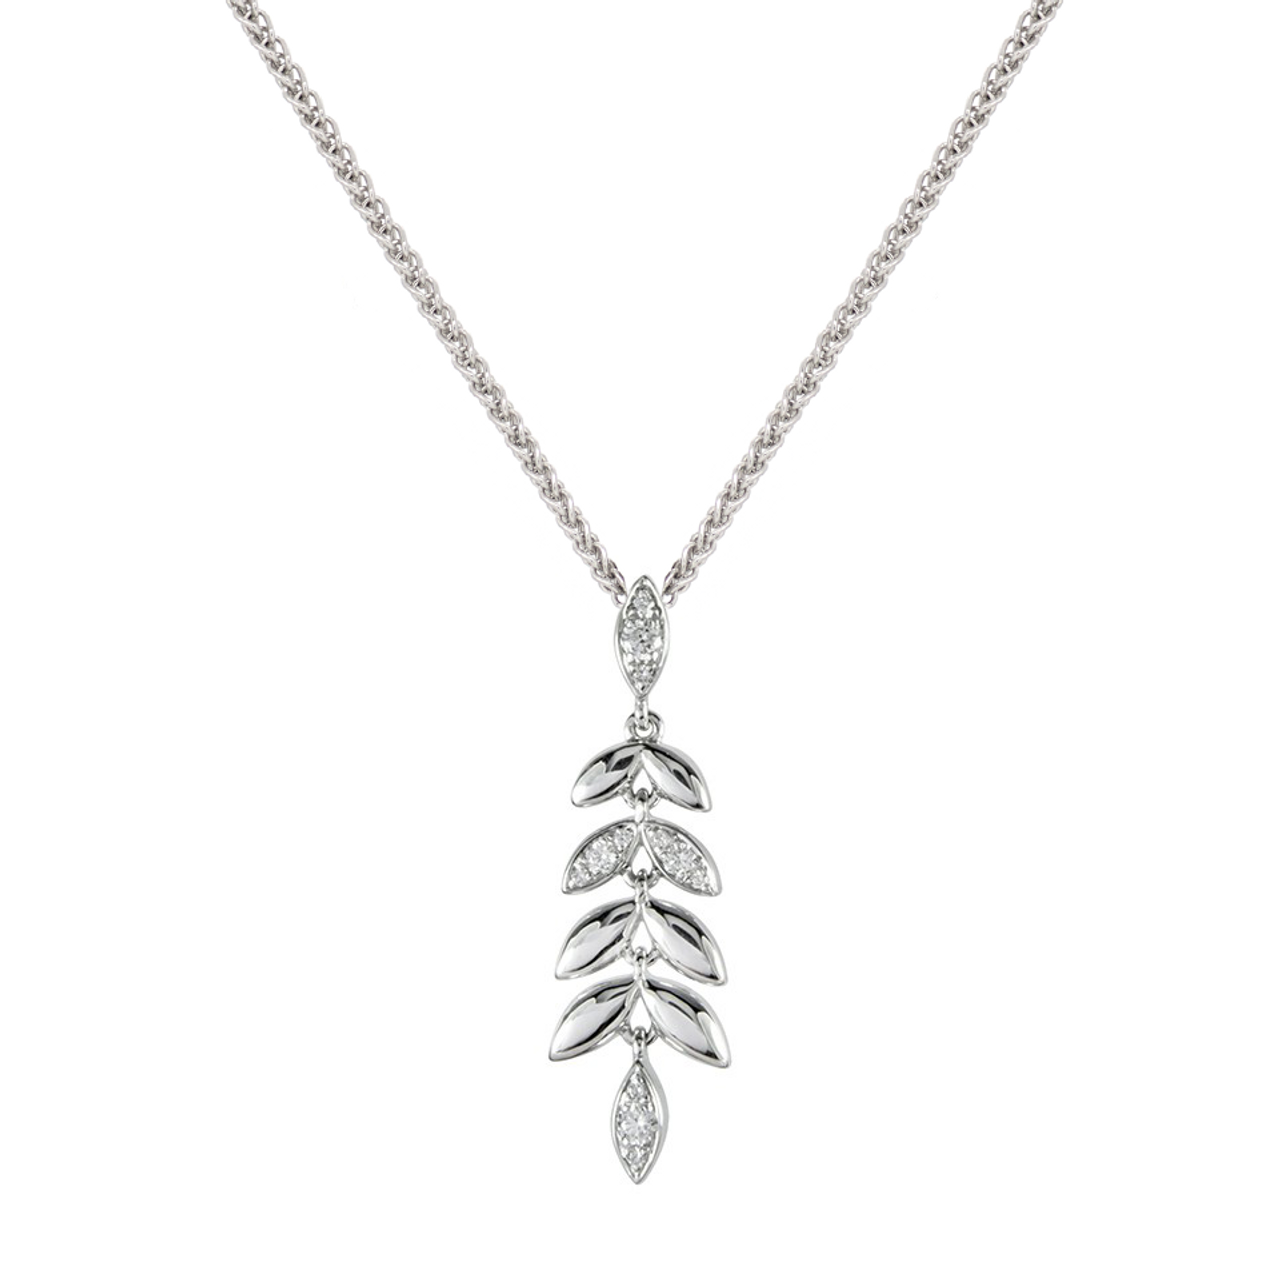 18ct White Gold Diamond Barleycorn Pendant & Chain